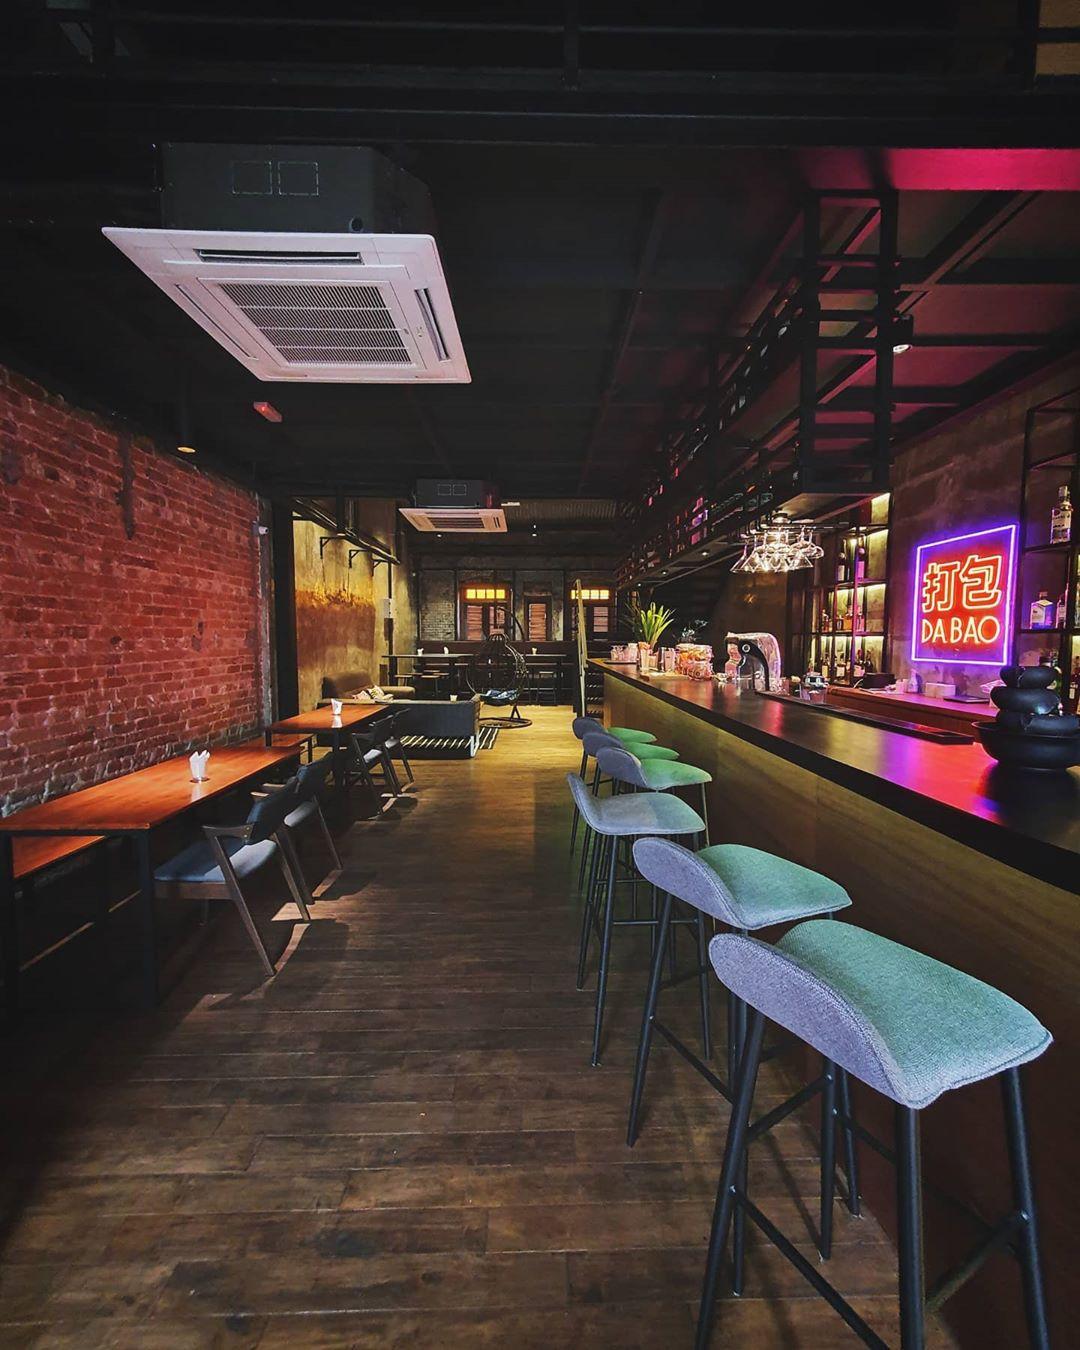 petaling street cafes - da bao restobar